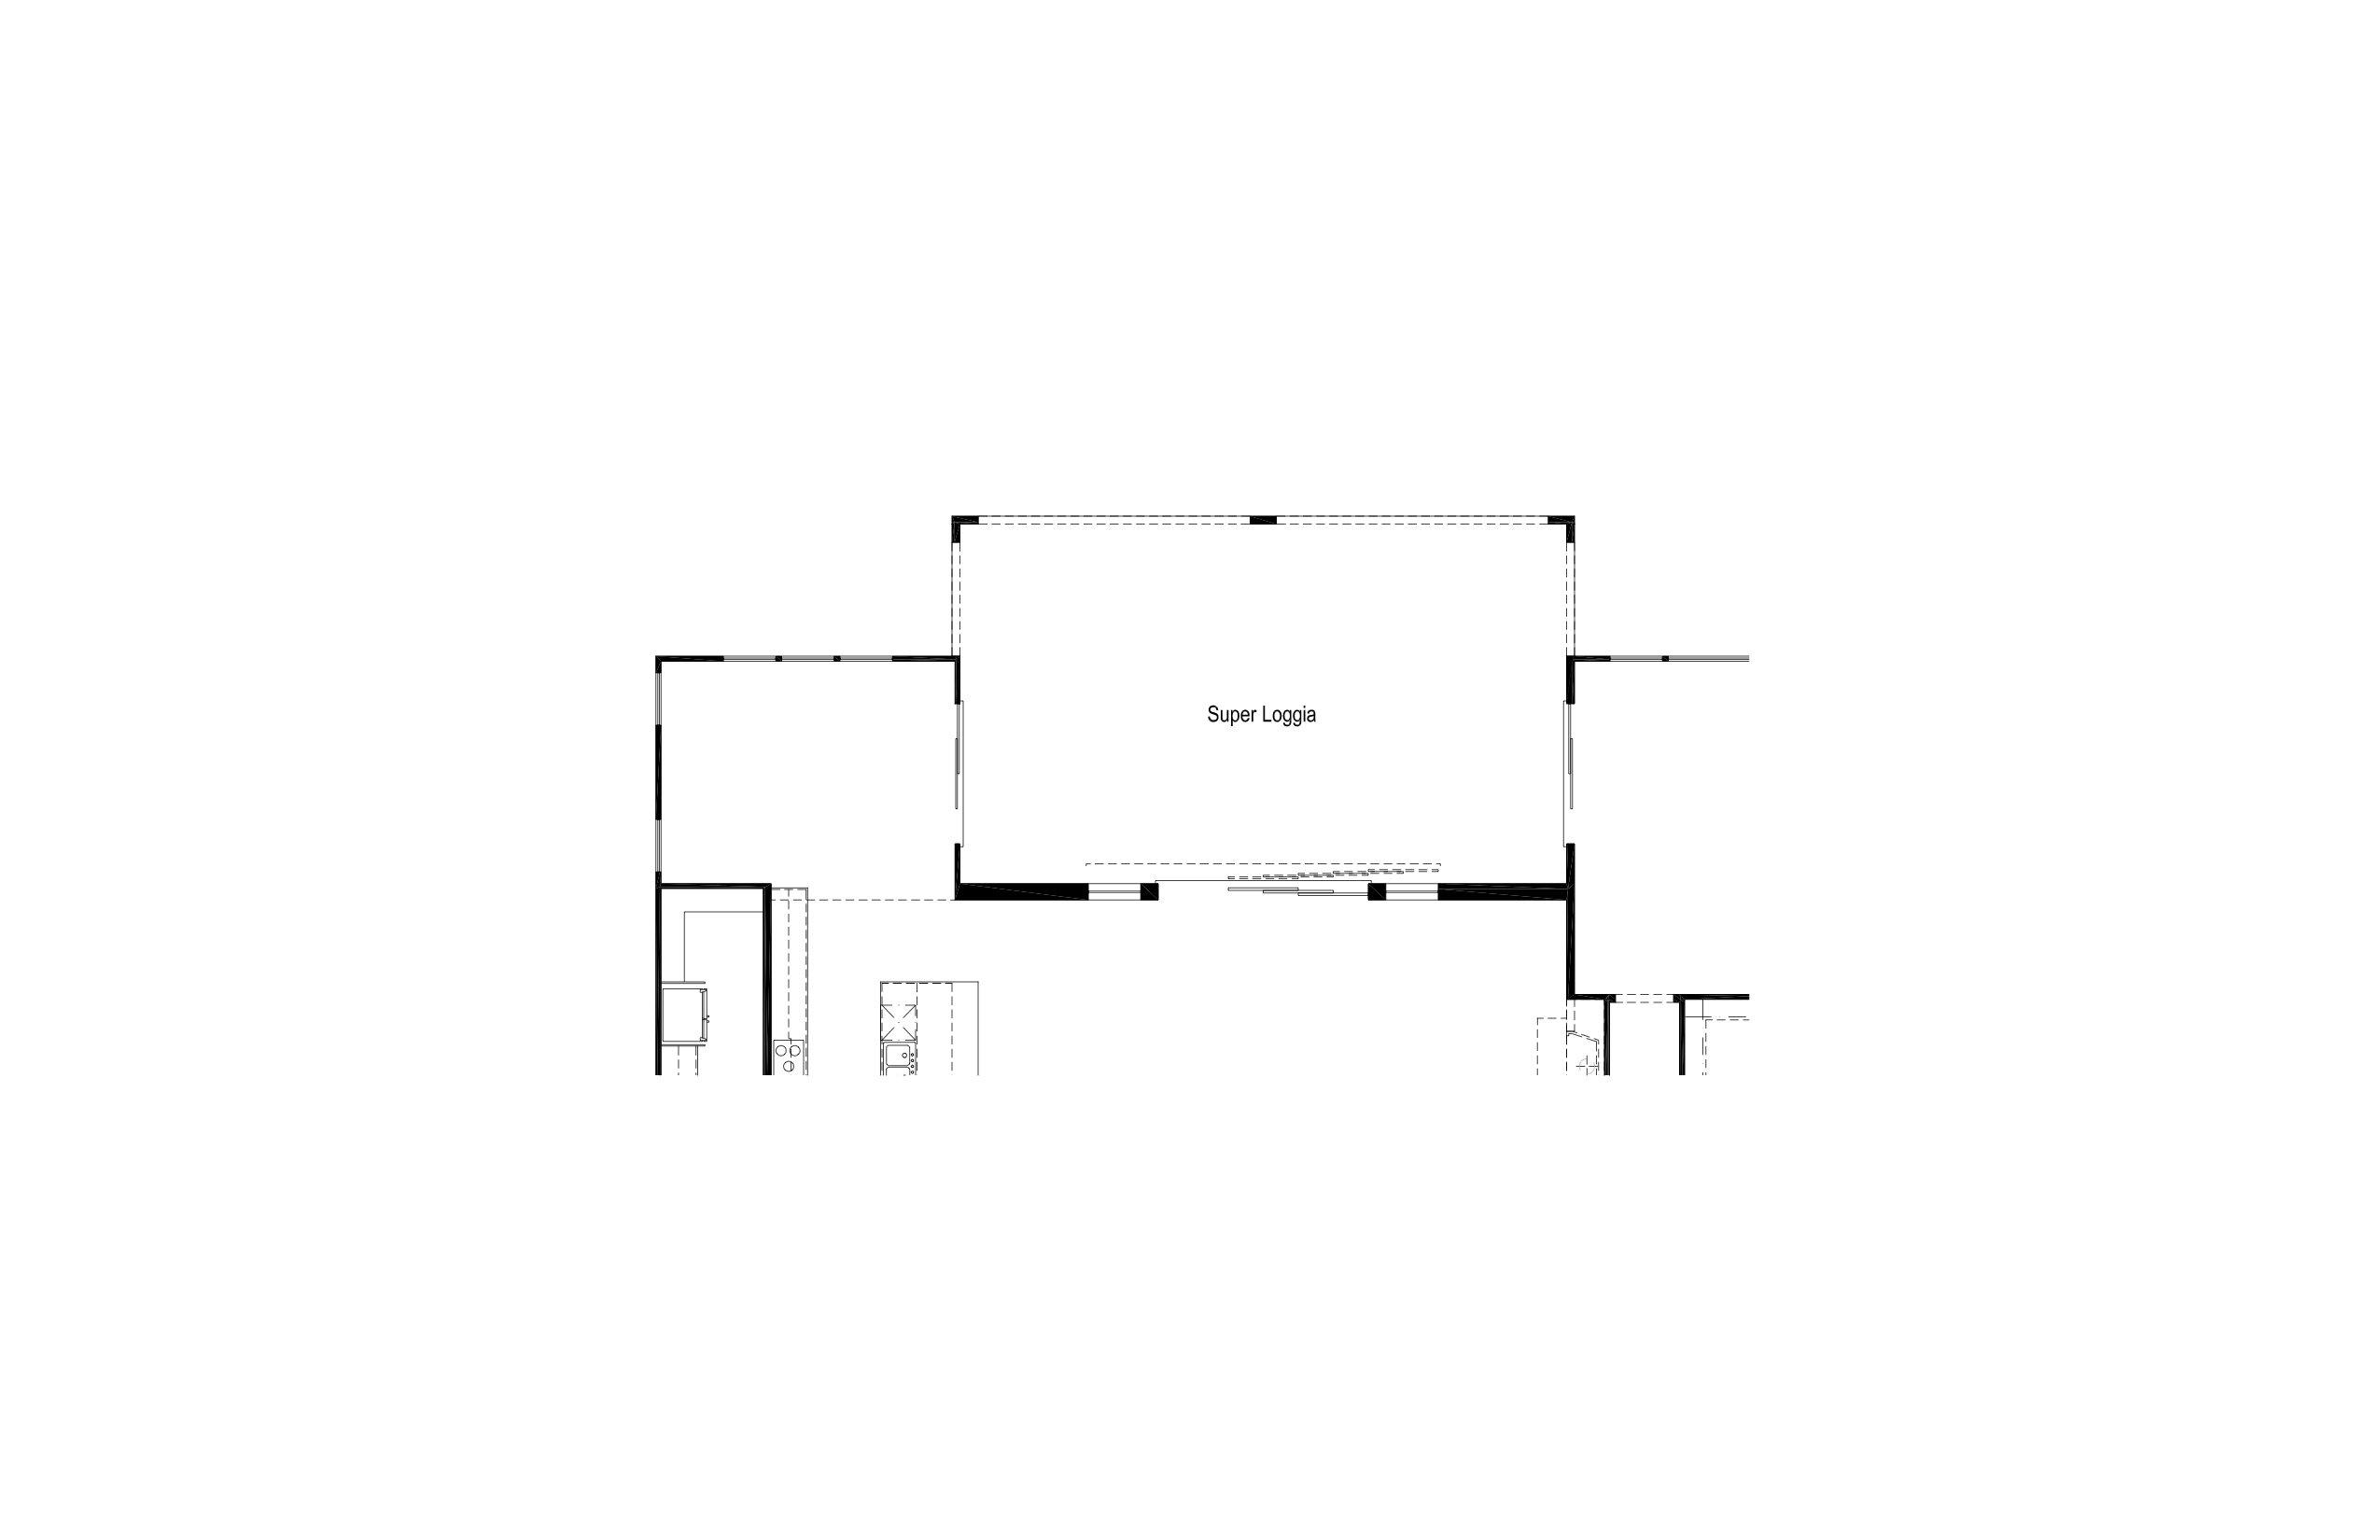 Plan 1 - Opt Super Loggia